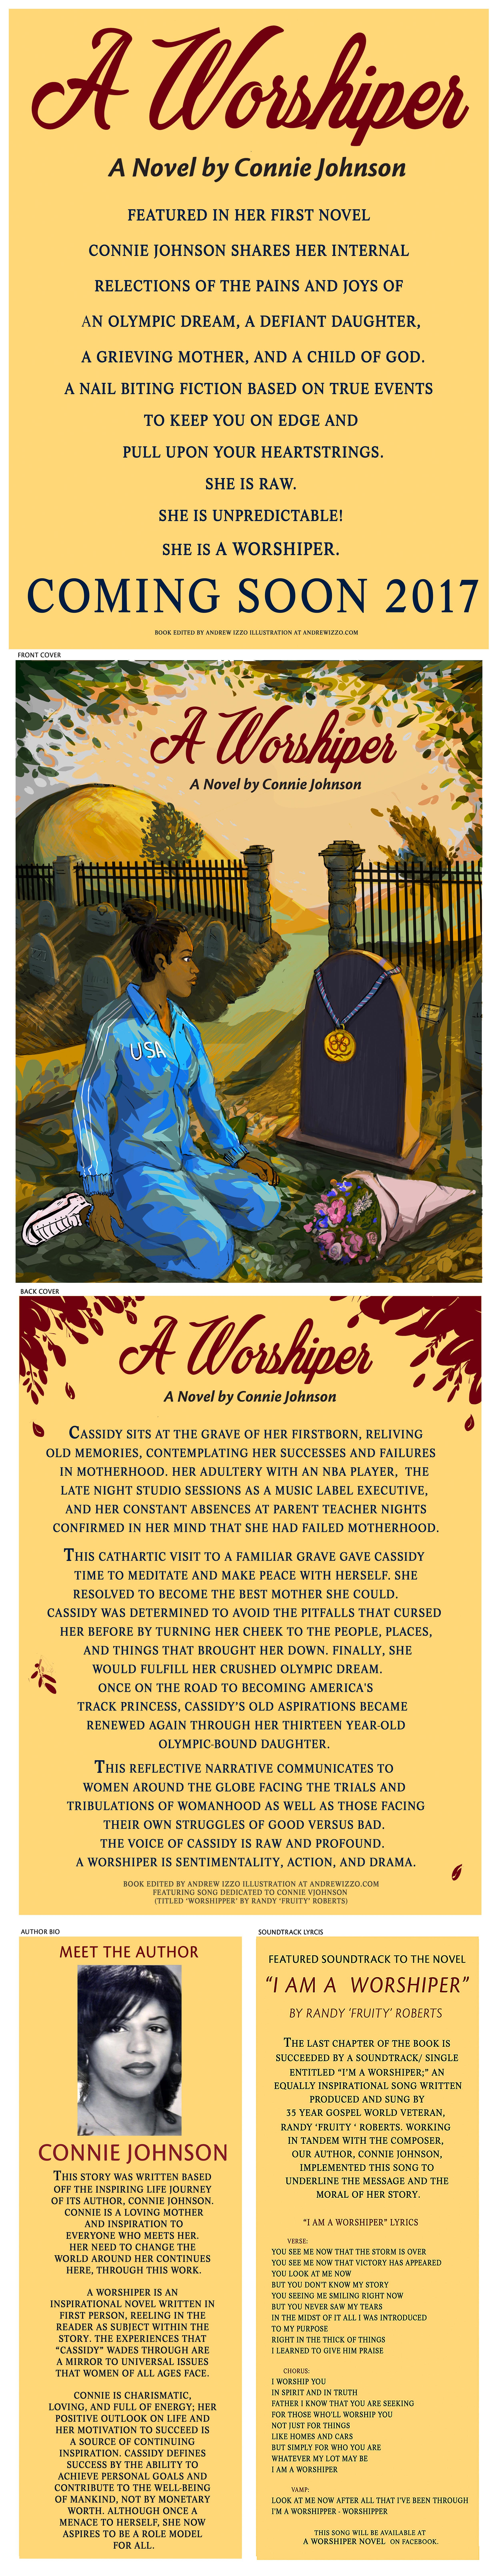 _a worshipper med.jpg